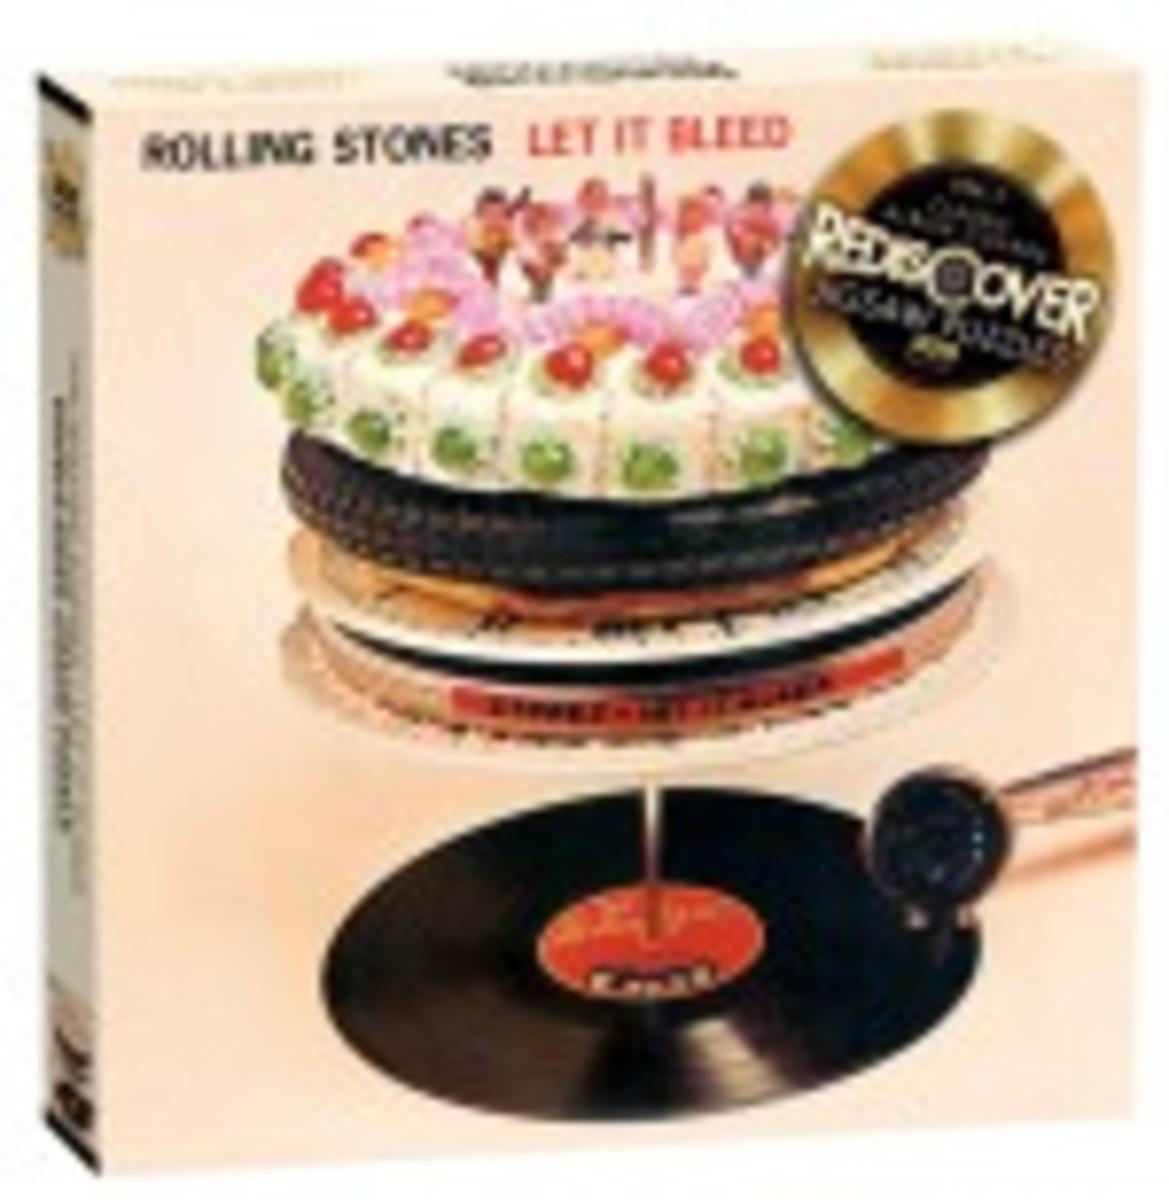 6133_Rolling Stones_WEB